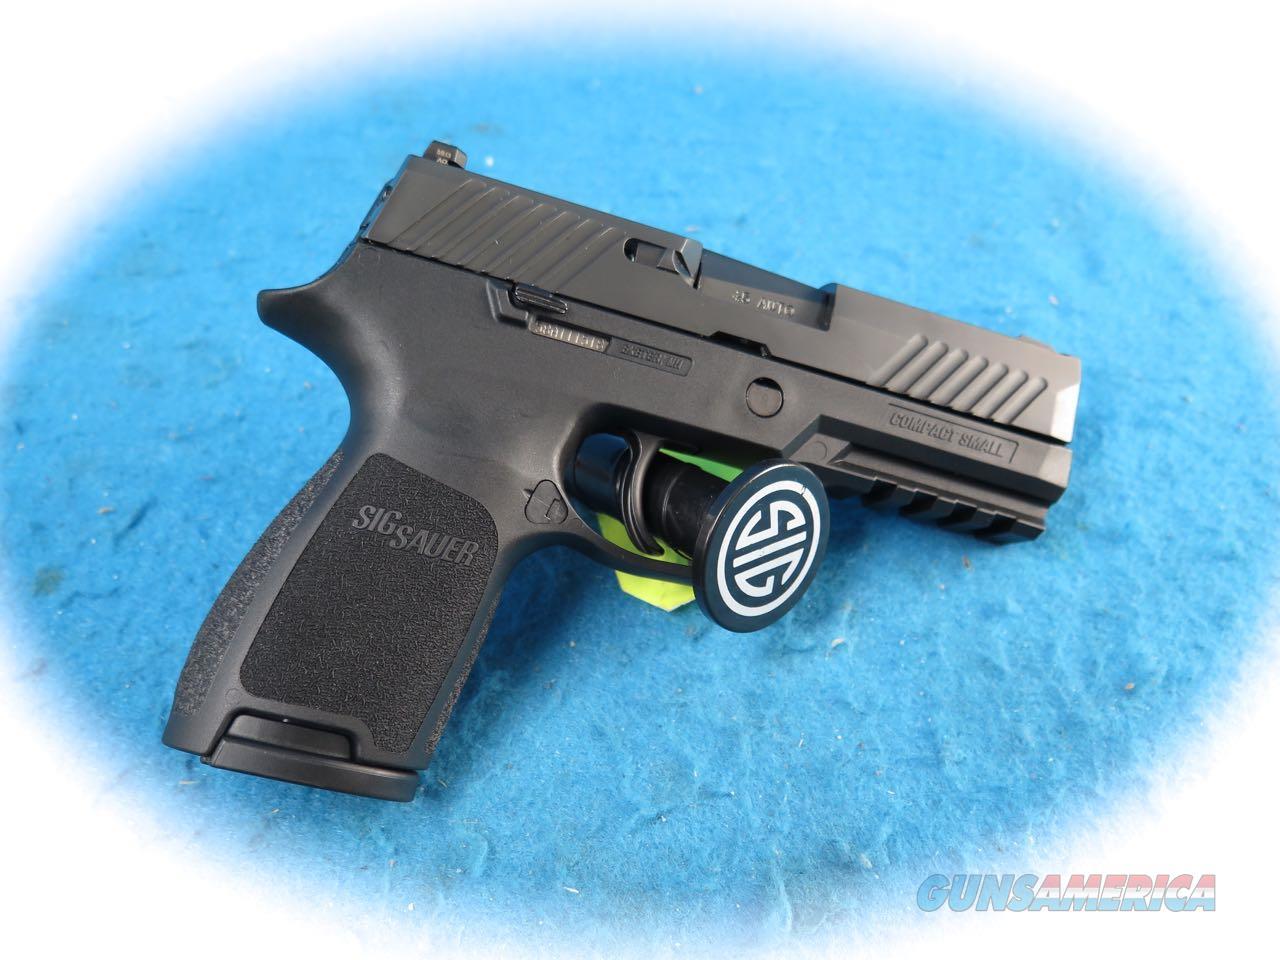 Sig Sauer P320C  Nitron Compact .45ACP Pistol Model 320C-45-BSS **New**  Guns > Pistols > Sig - Sauer/Sigarms Pistols > P320